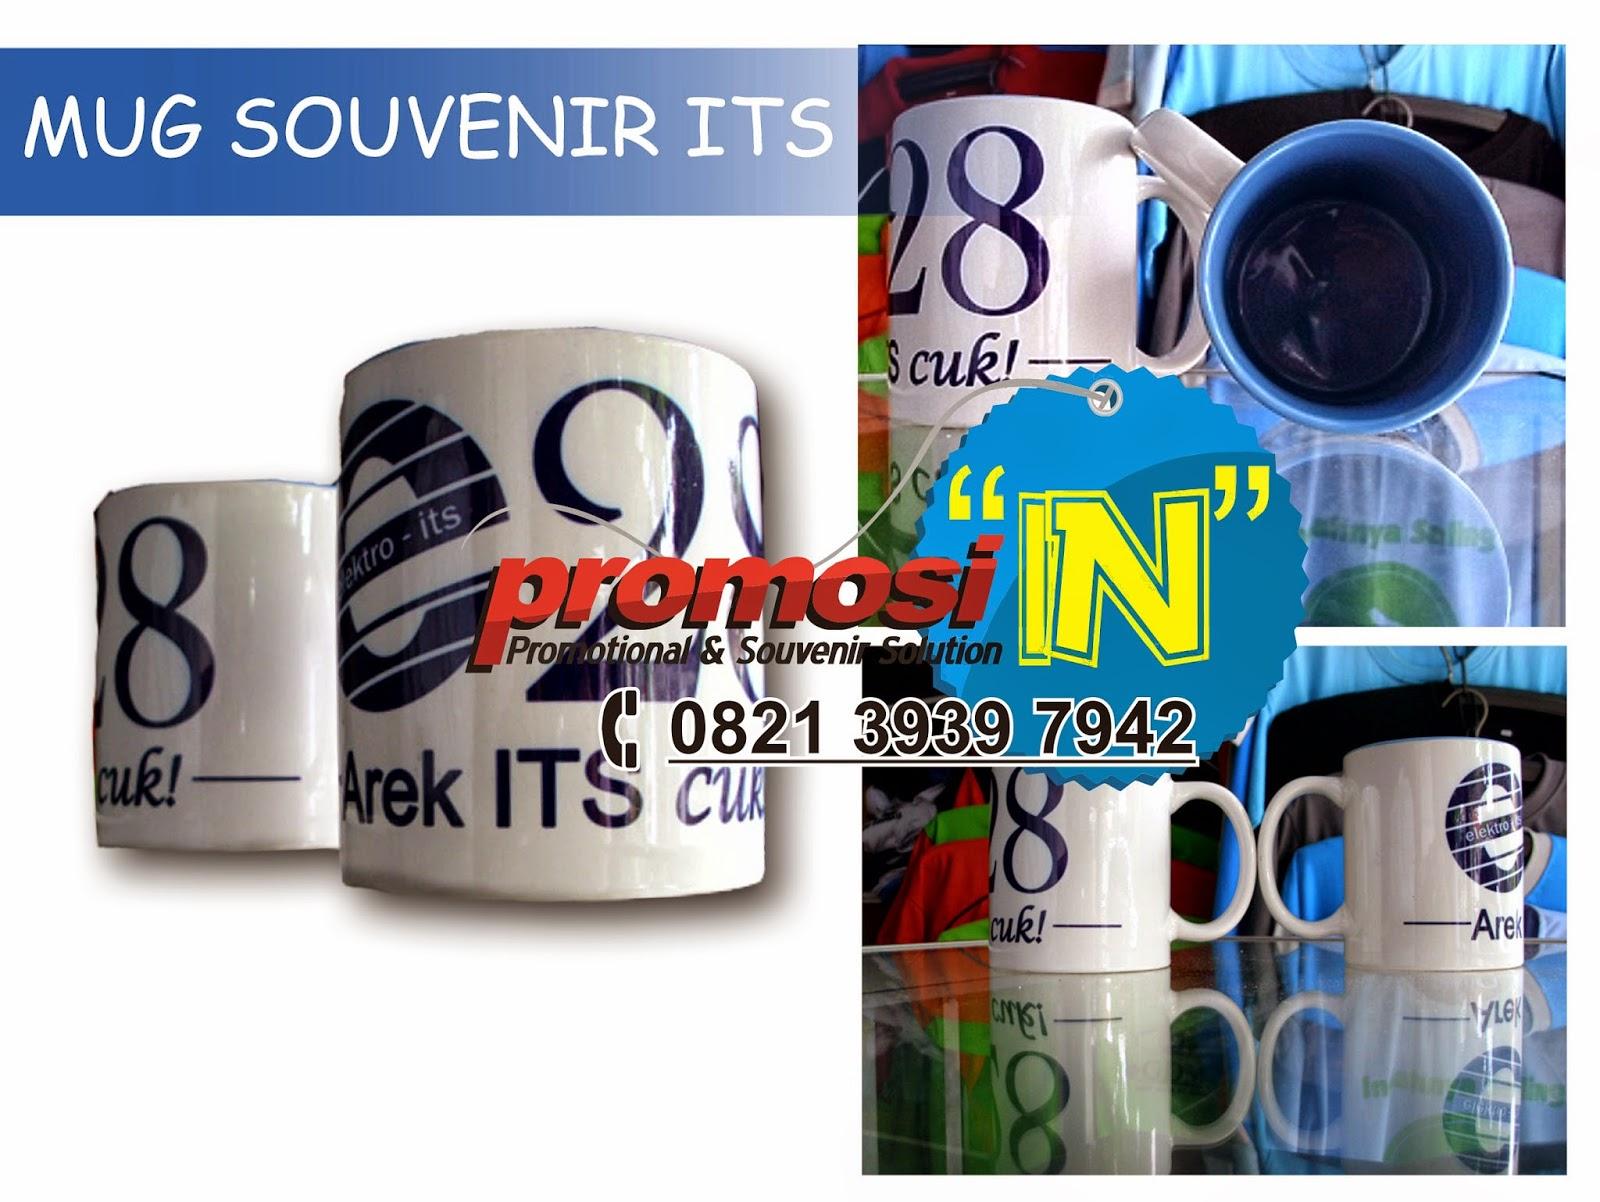 Mug, Produsen Mug Printing, Mug Promosi, Produsen Mug Promosi Murah